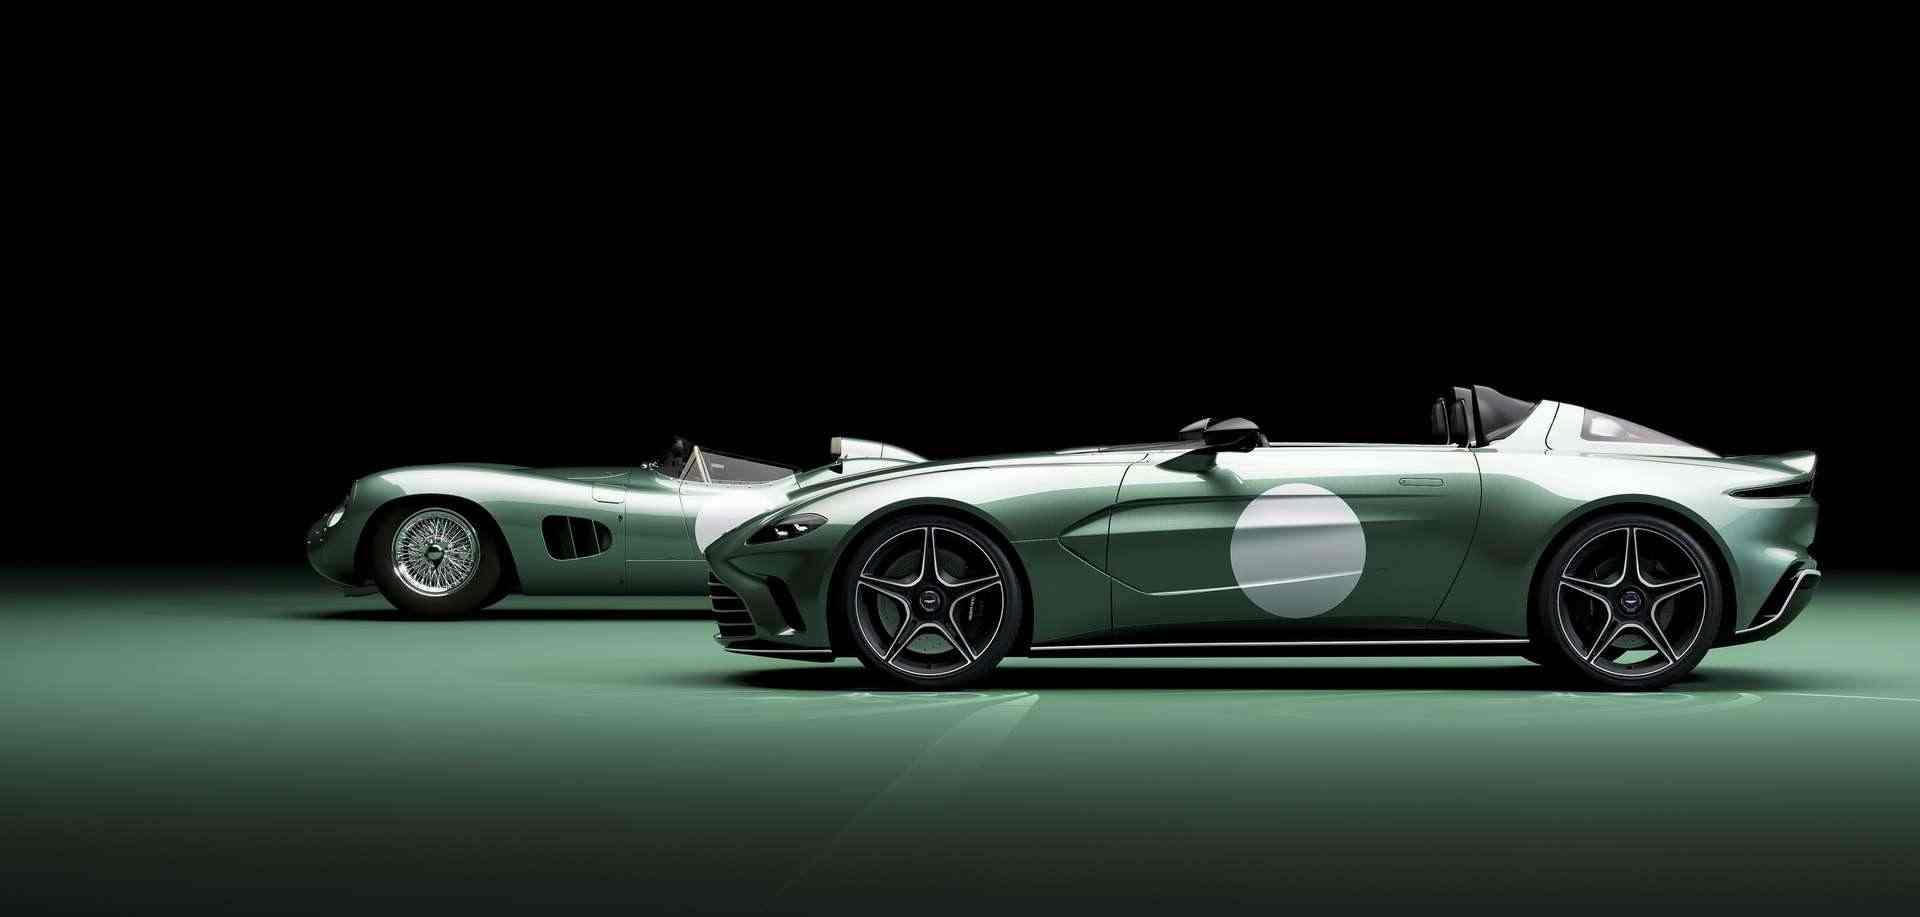 Aston_Martin_V12_Speedster_DBR1_Pack-0001